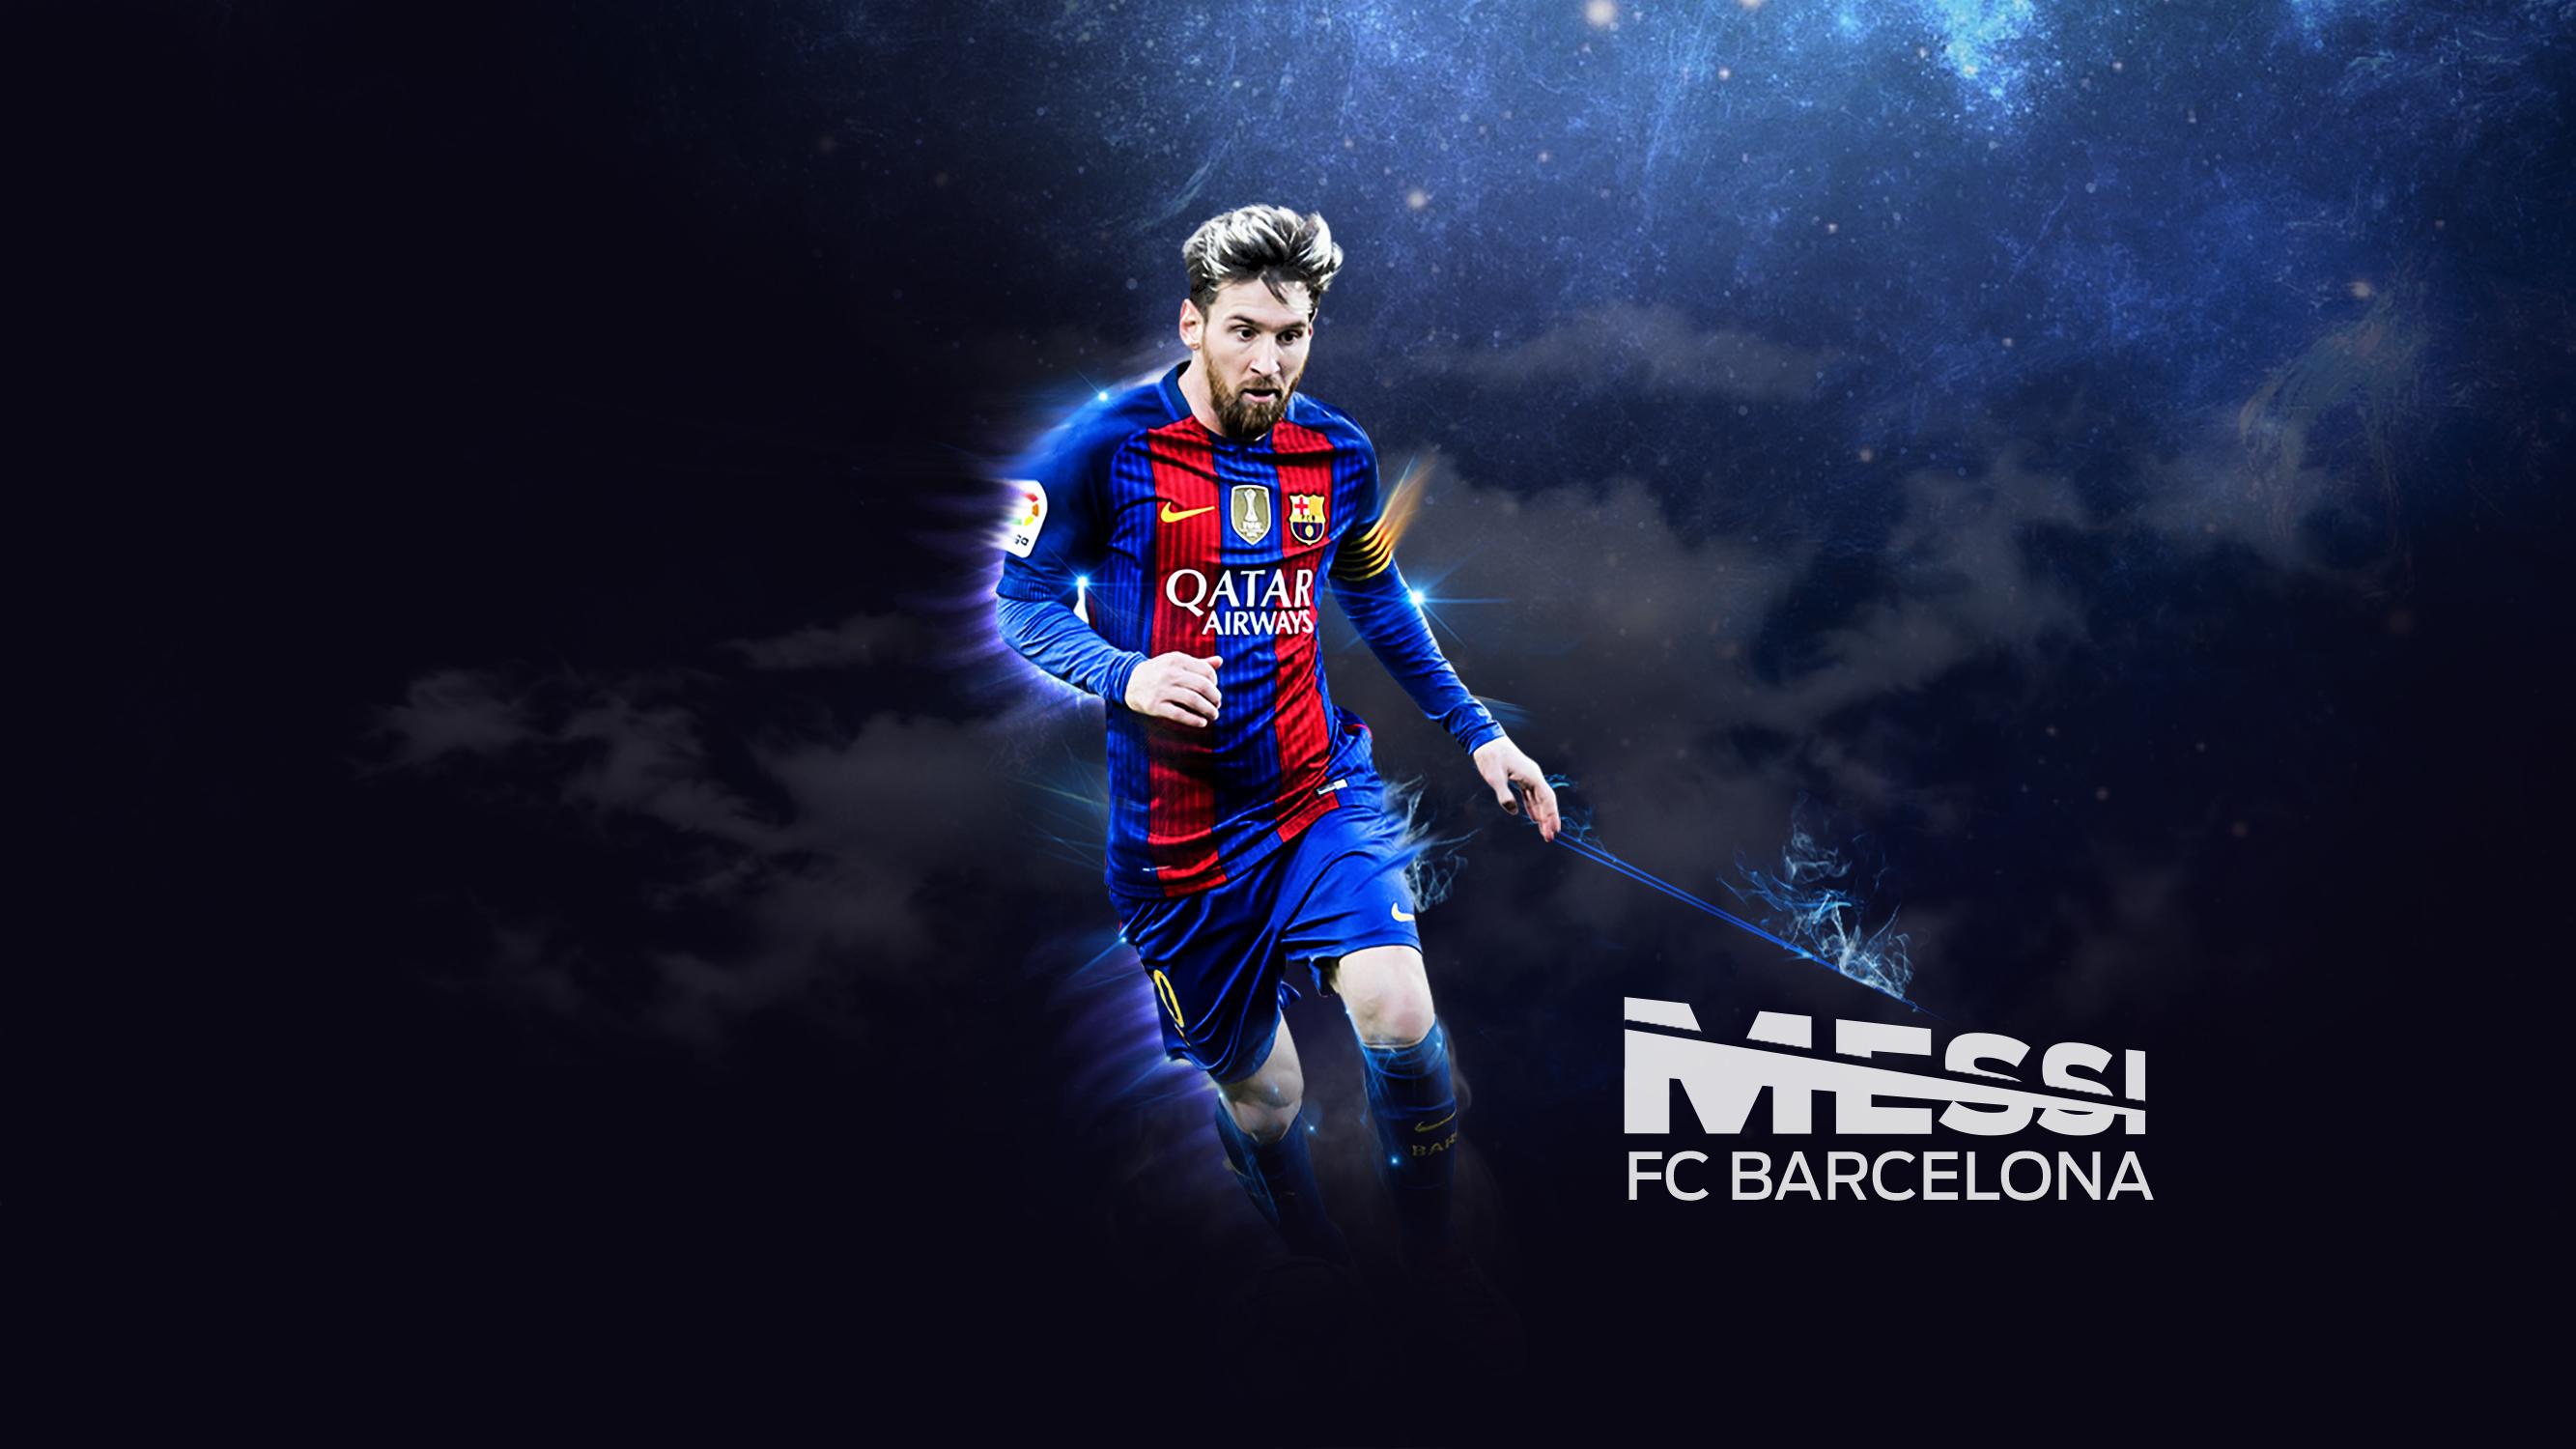 Wallpaper 4k Lionel Messi Fc Barcelona Footballer 2017 Barcelona Footballer Lionel Messi